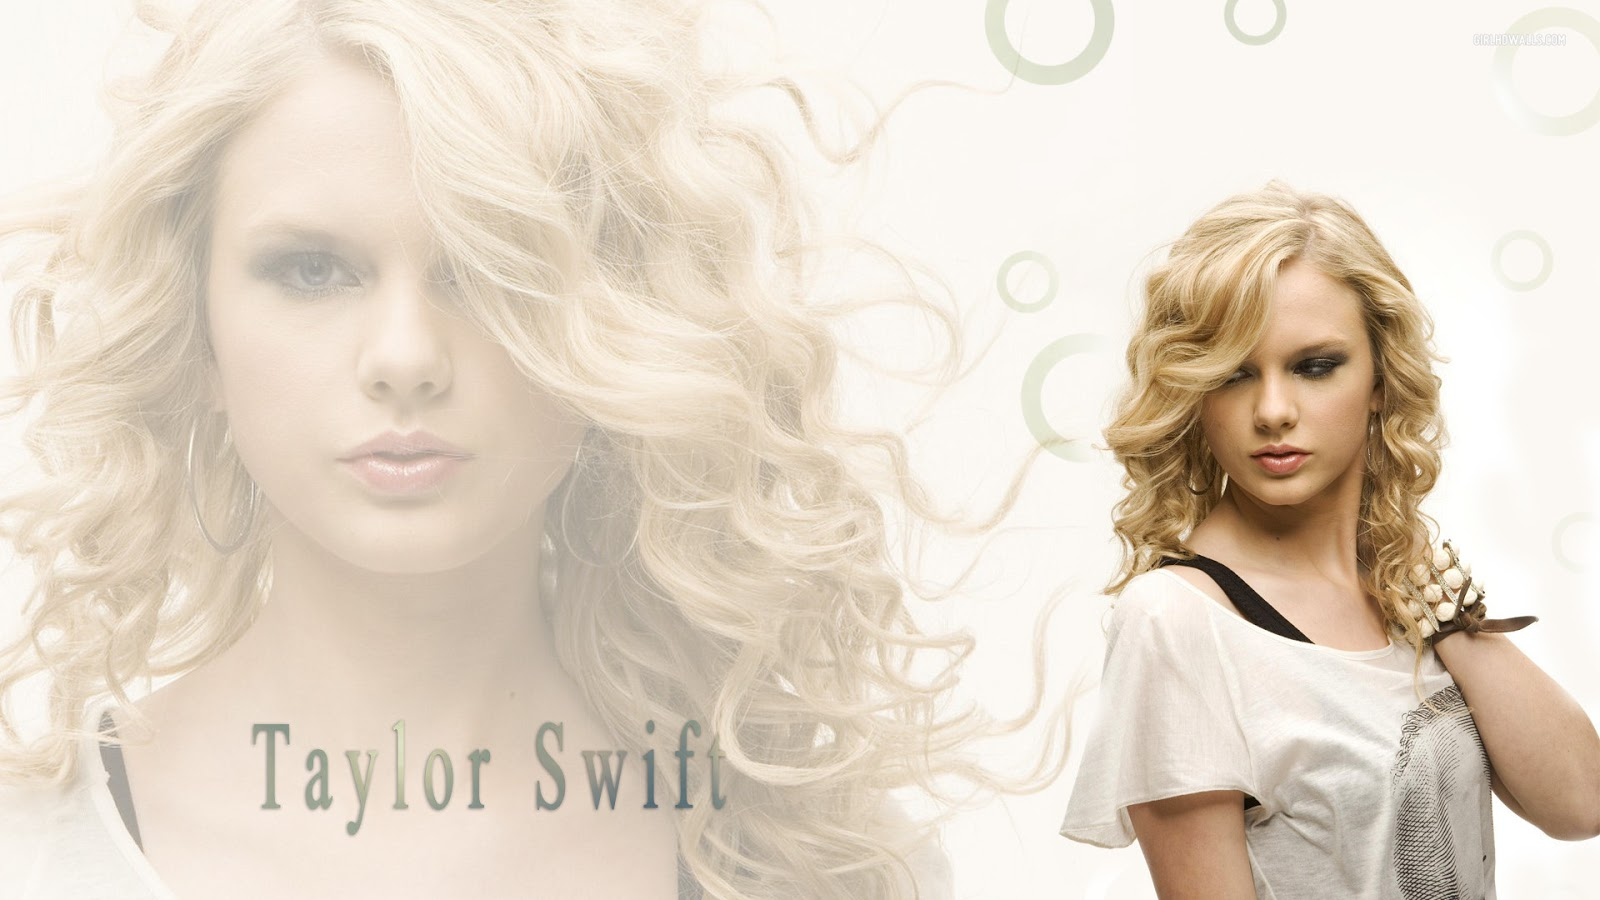 Taylor Swift Actress Wallpaper